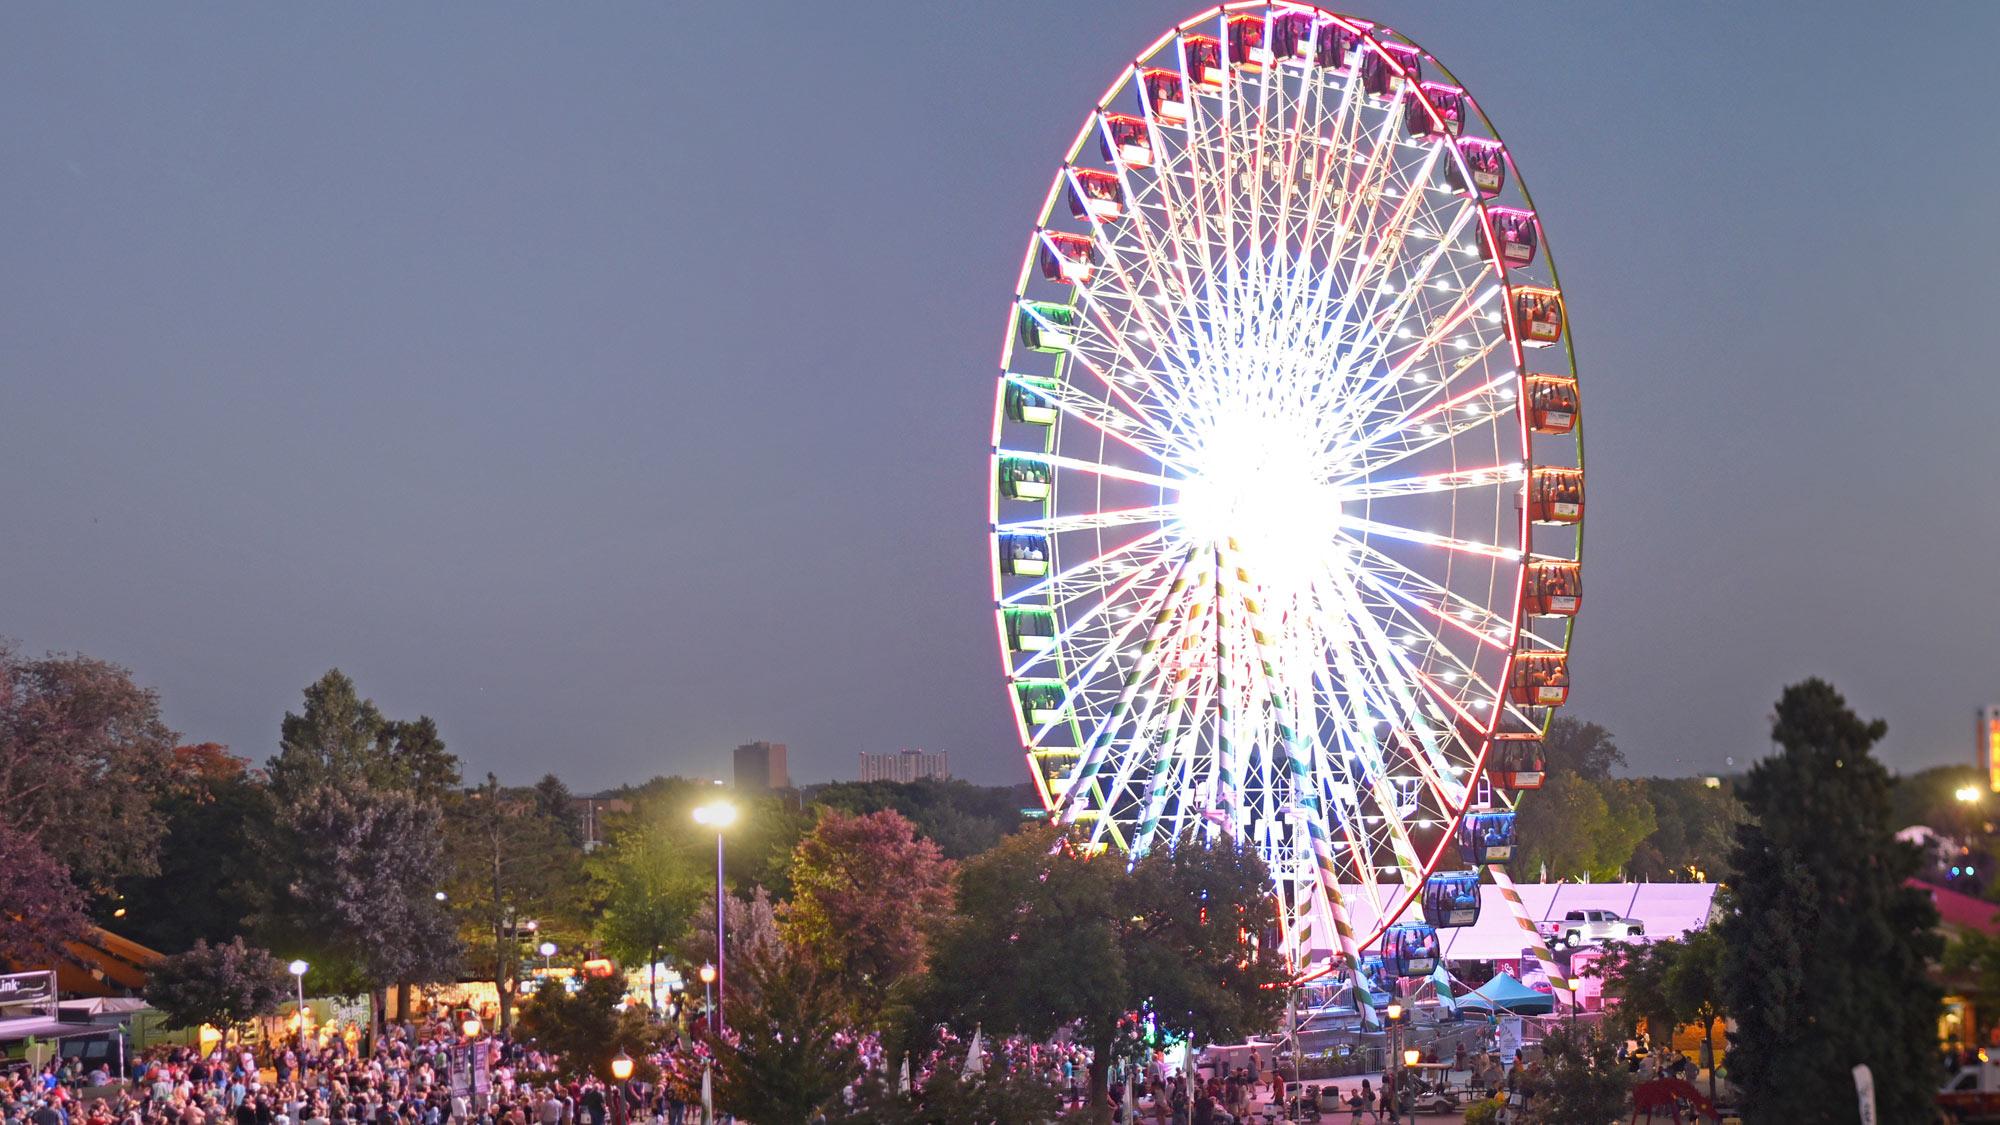 Great Big Wheel